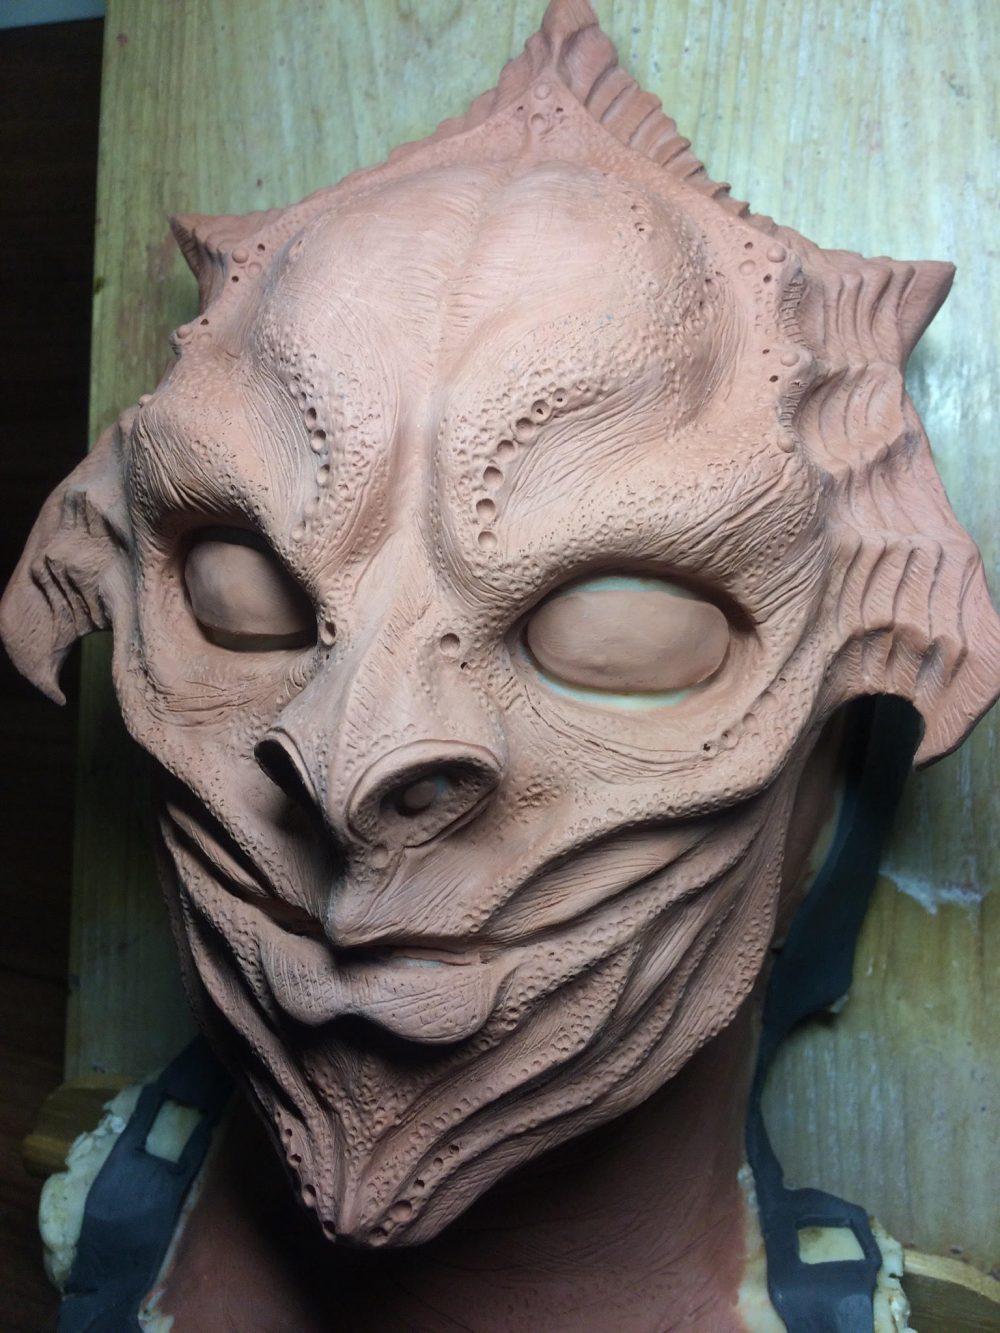 SFX prosthetic make-up